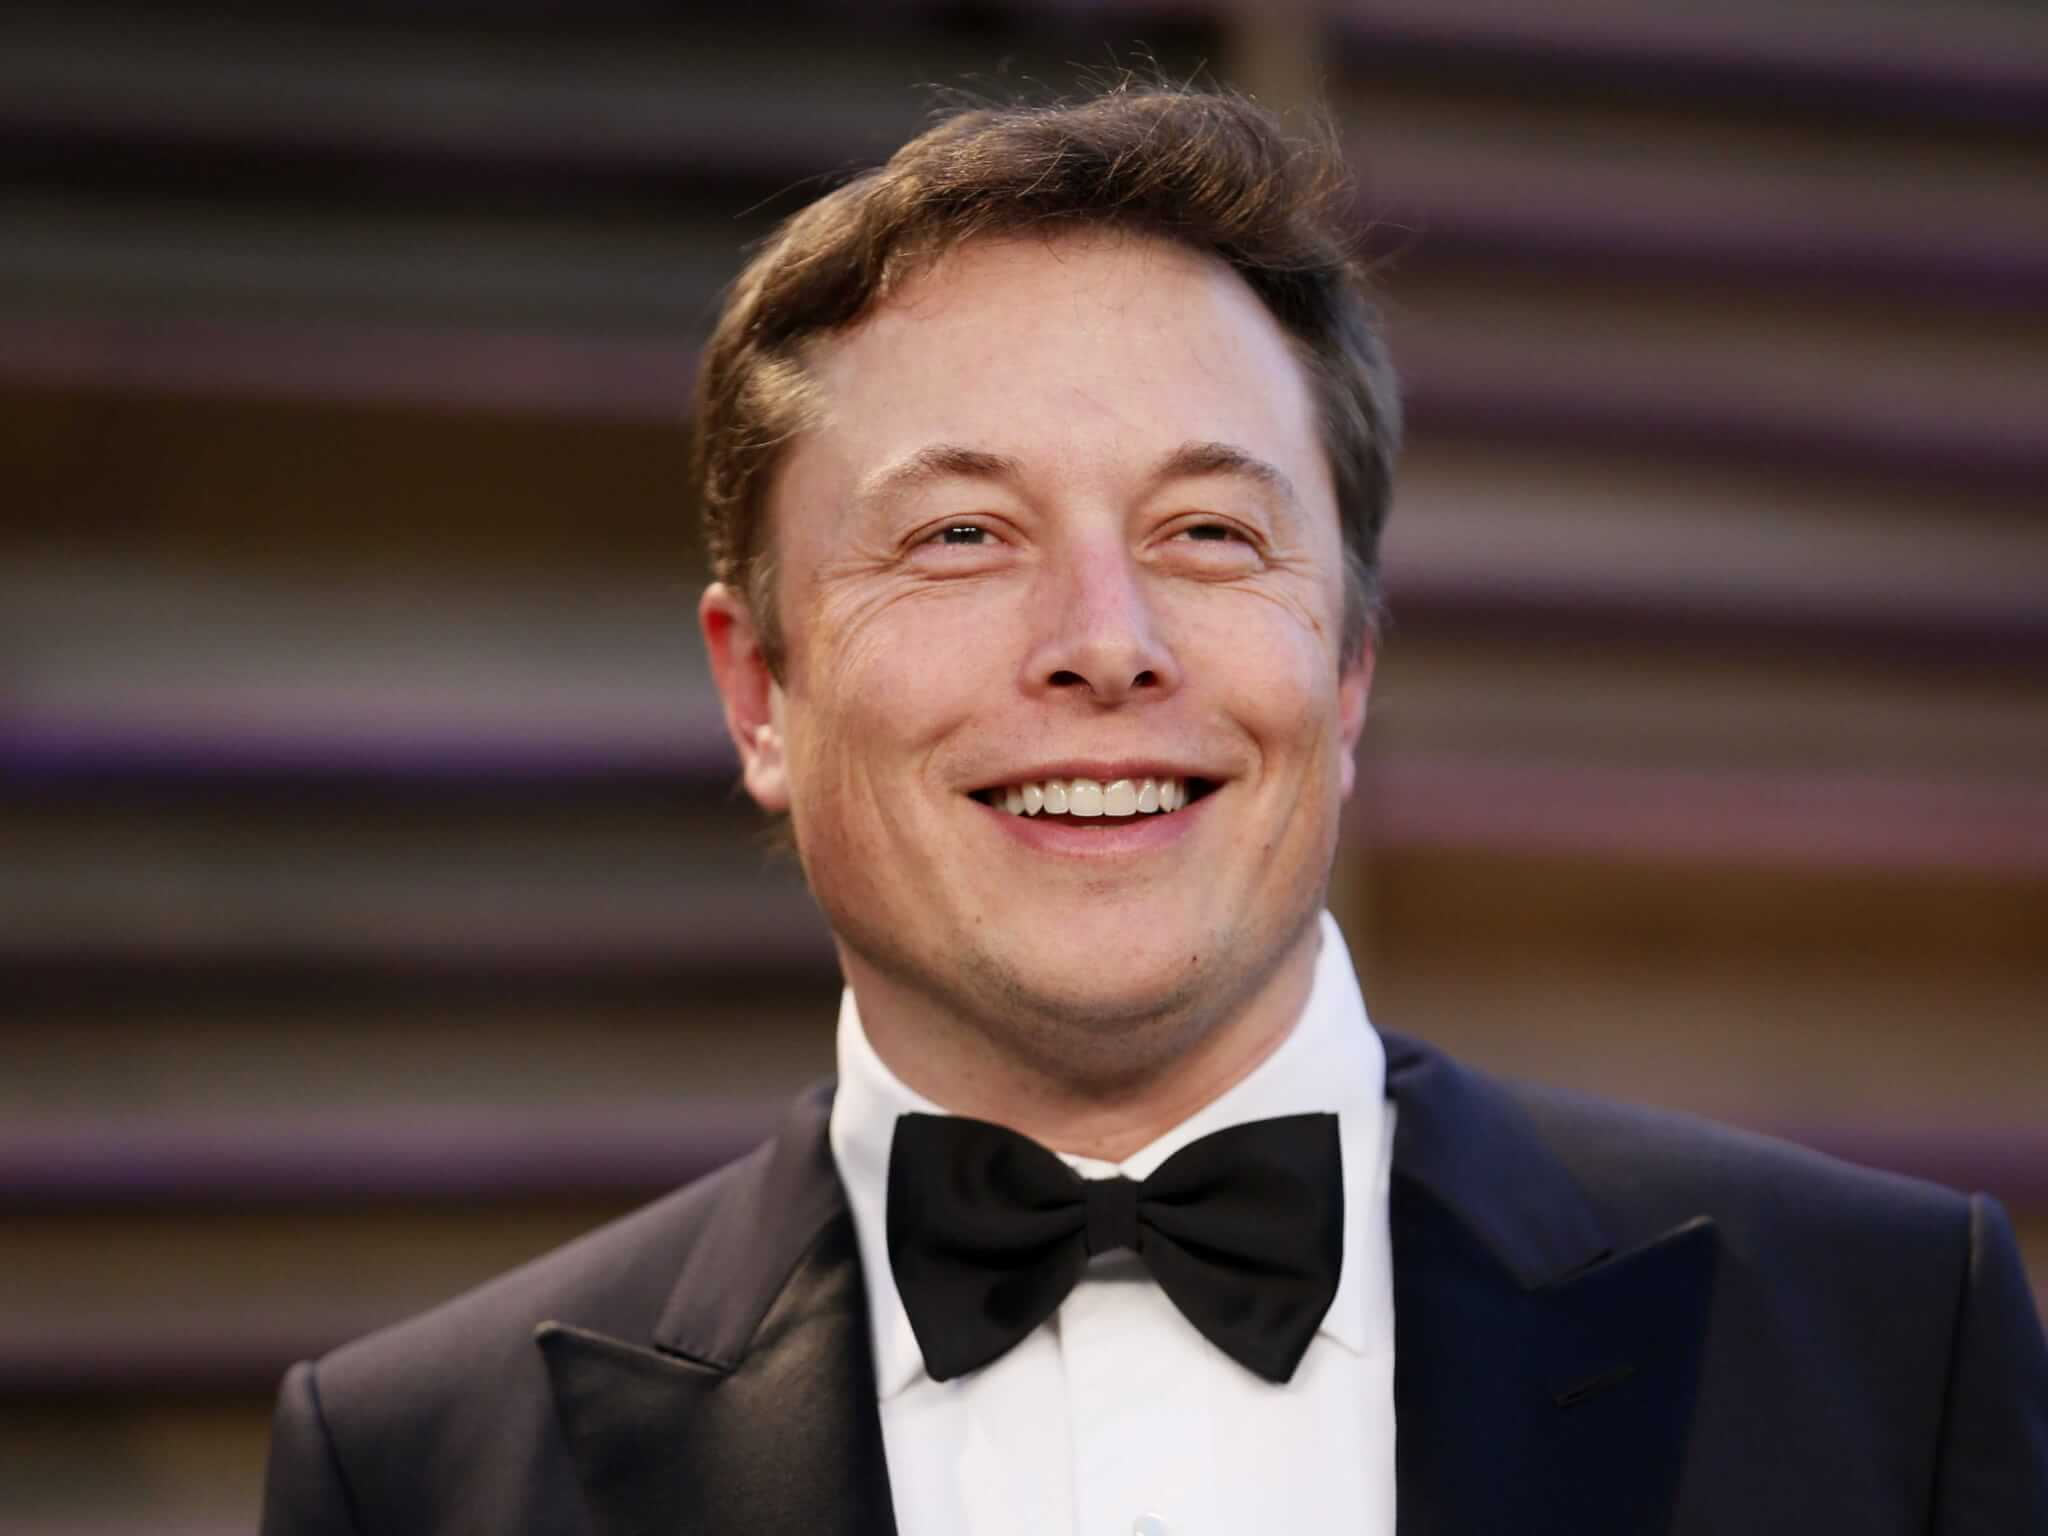 elonk musk - Até Elonk Musk joga Overwatch, e ele adora